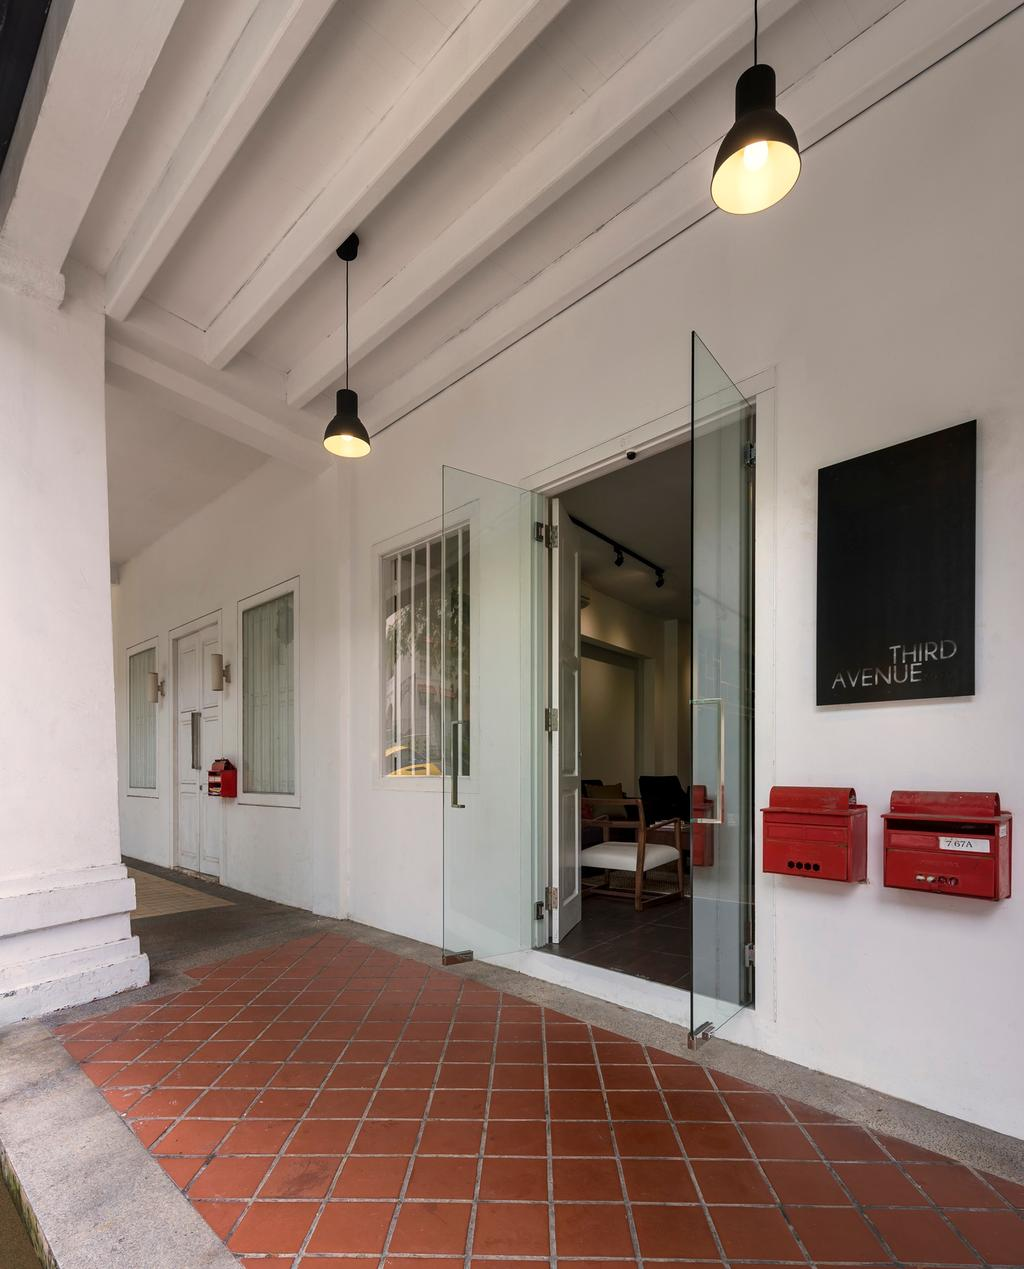 Kim Yam Road (River Valley), Commercial, Interior Designer, Third Avenue Studio, Industrial, Outdoors, Exterior, Glass Doors, White, Tile, Tiles, HDB, Building, Housing, Indoors, Loft